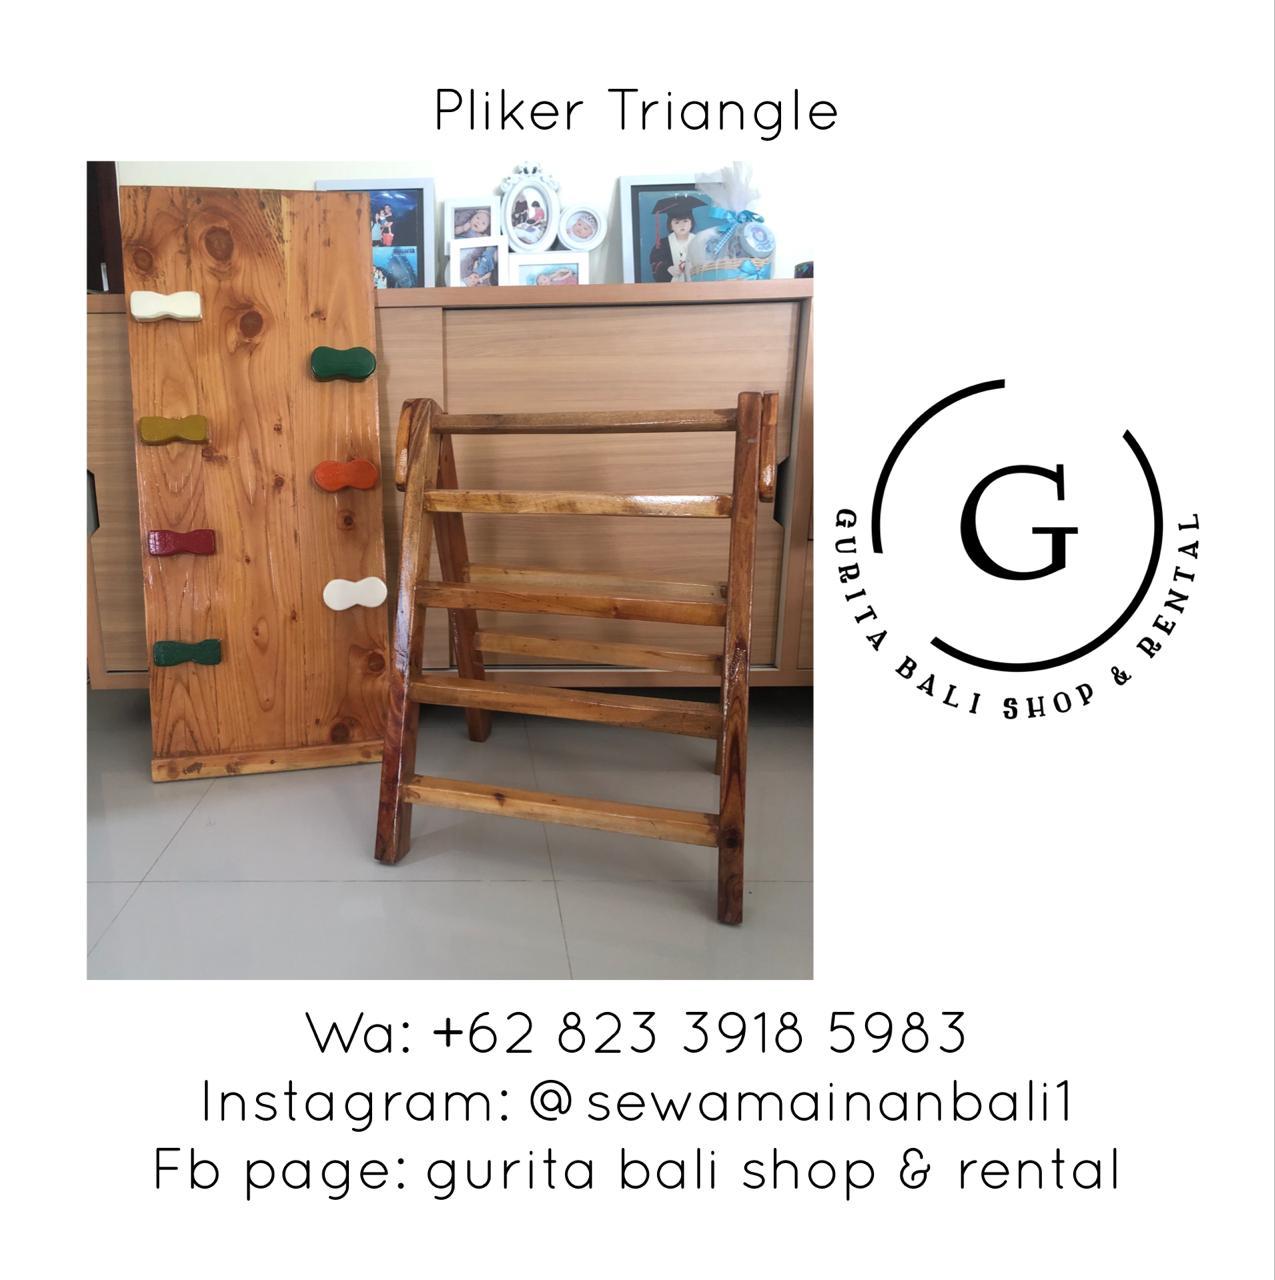 PLIKER TRIANGLE (2)